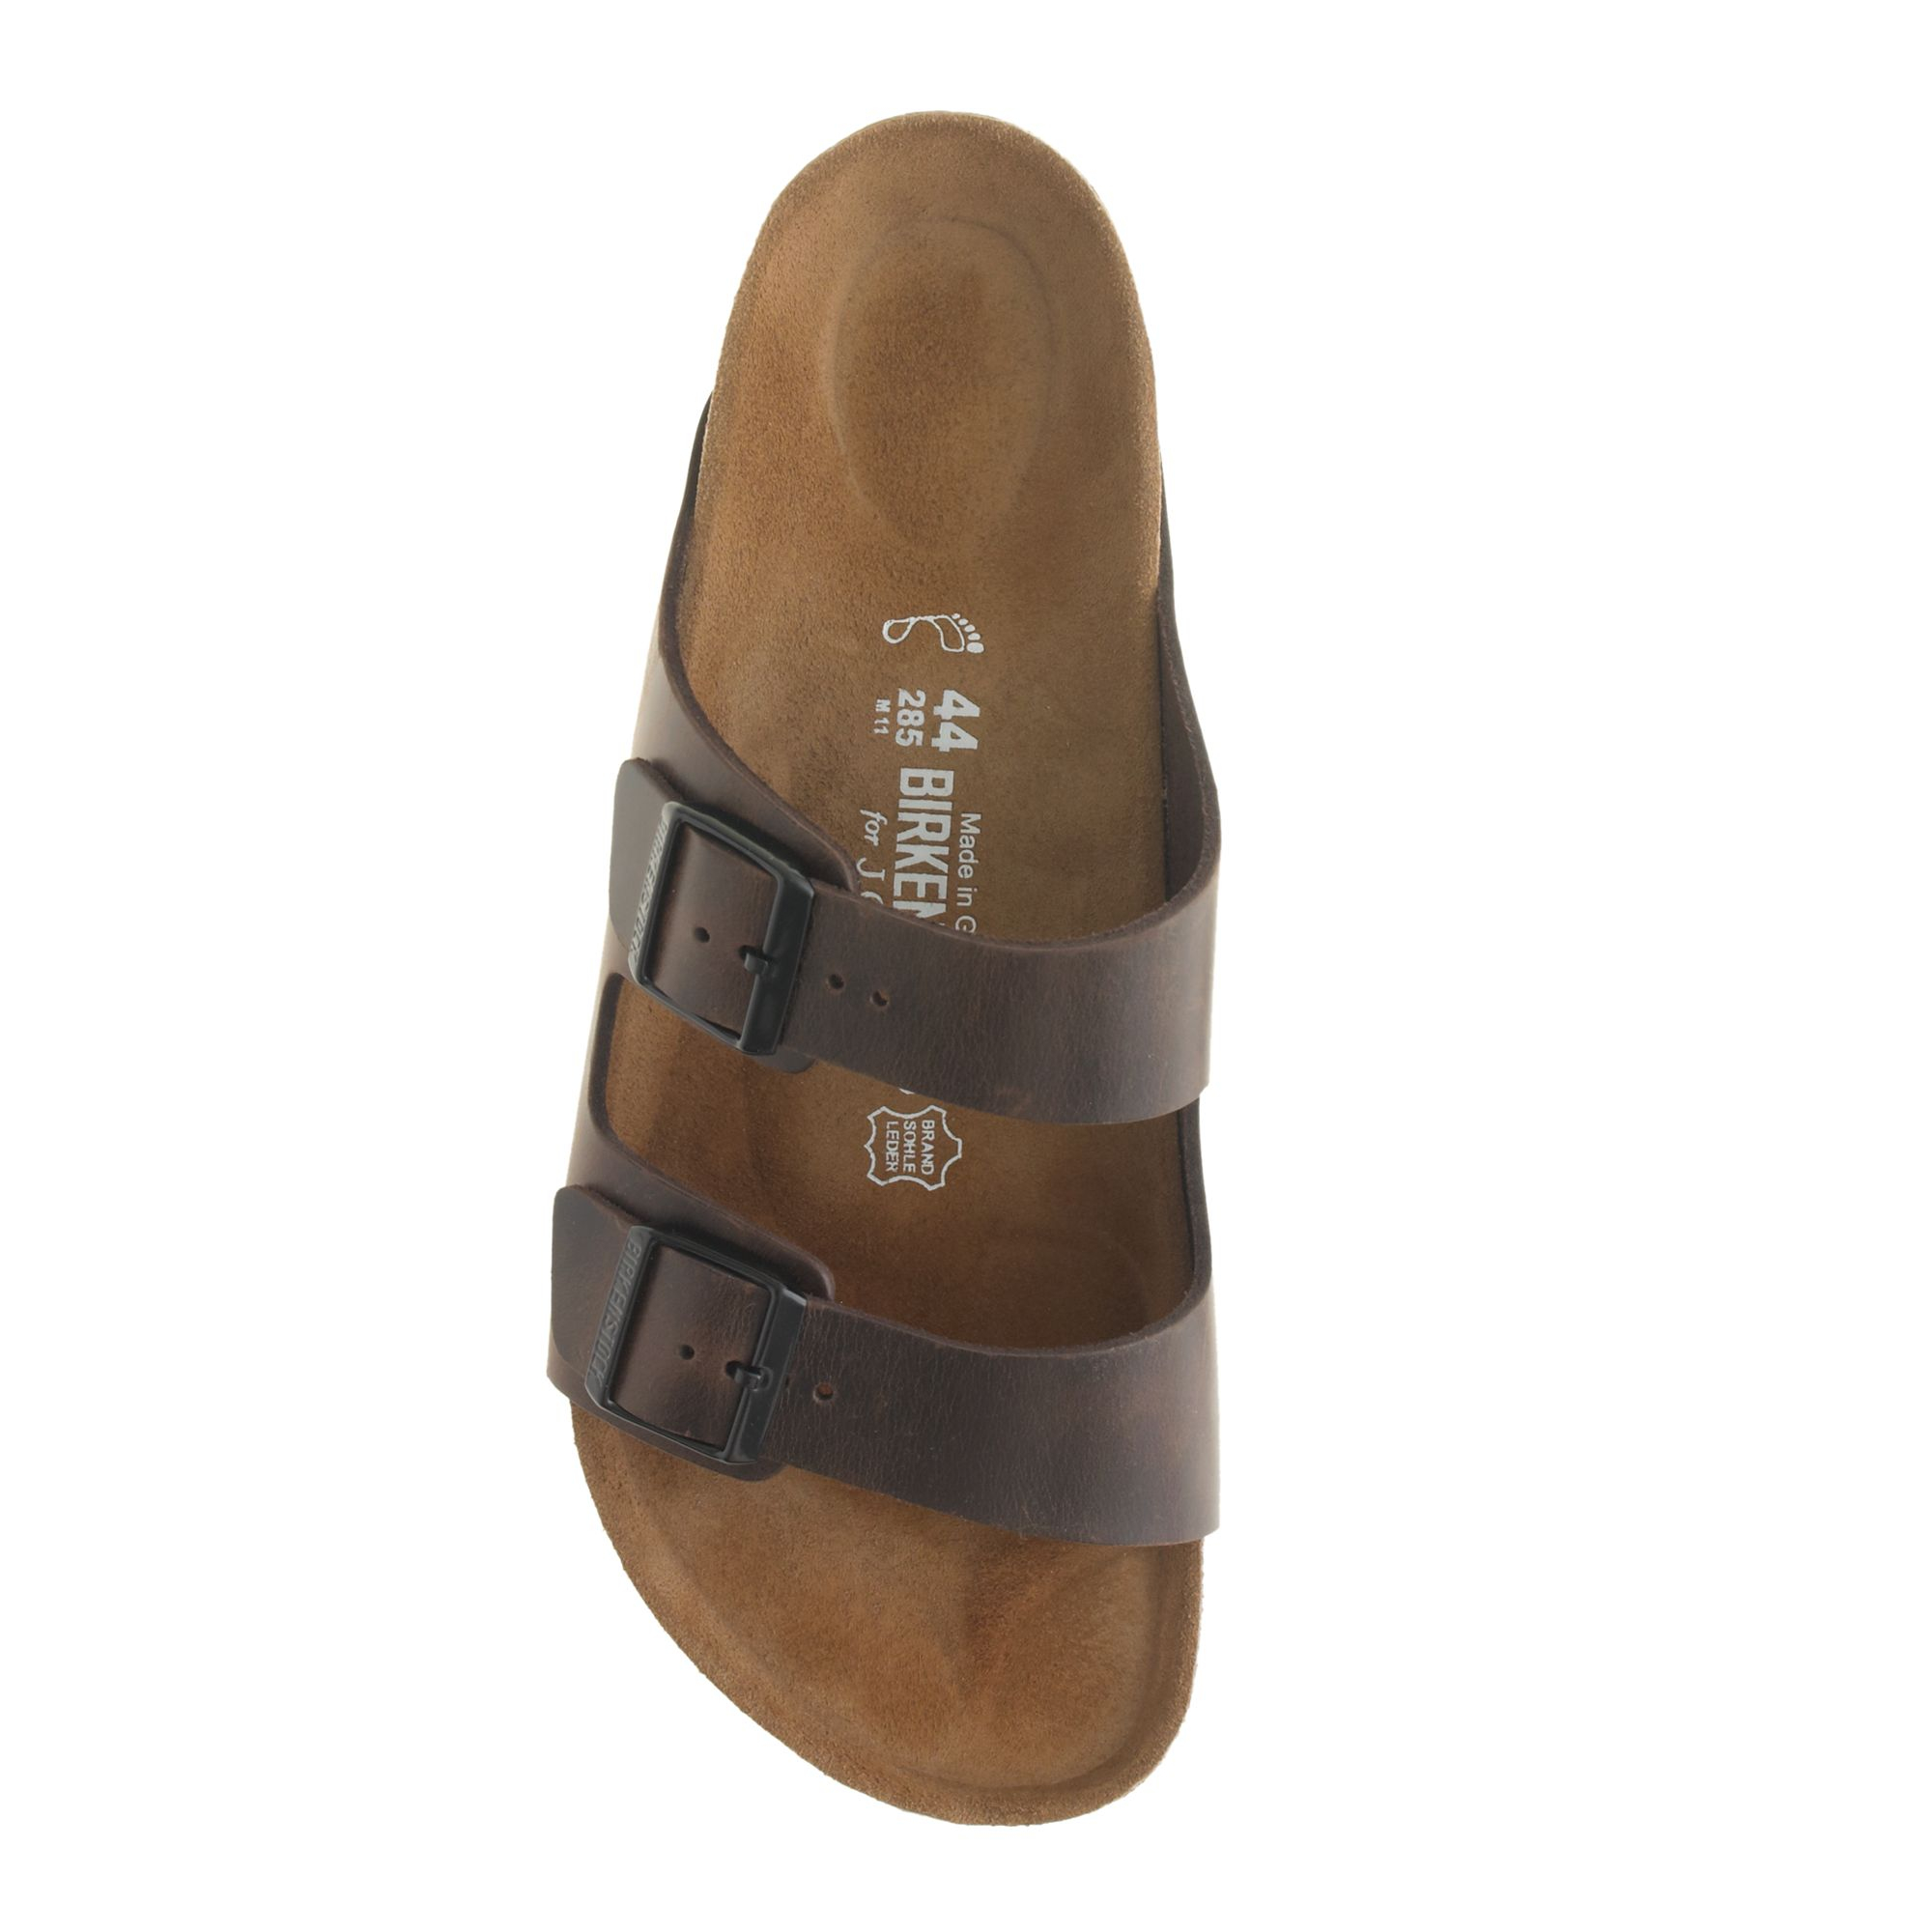 Birkenstock Medina Sandals Unisex Fashion Leather Slippers (Brown)